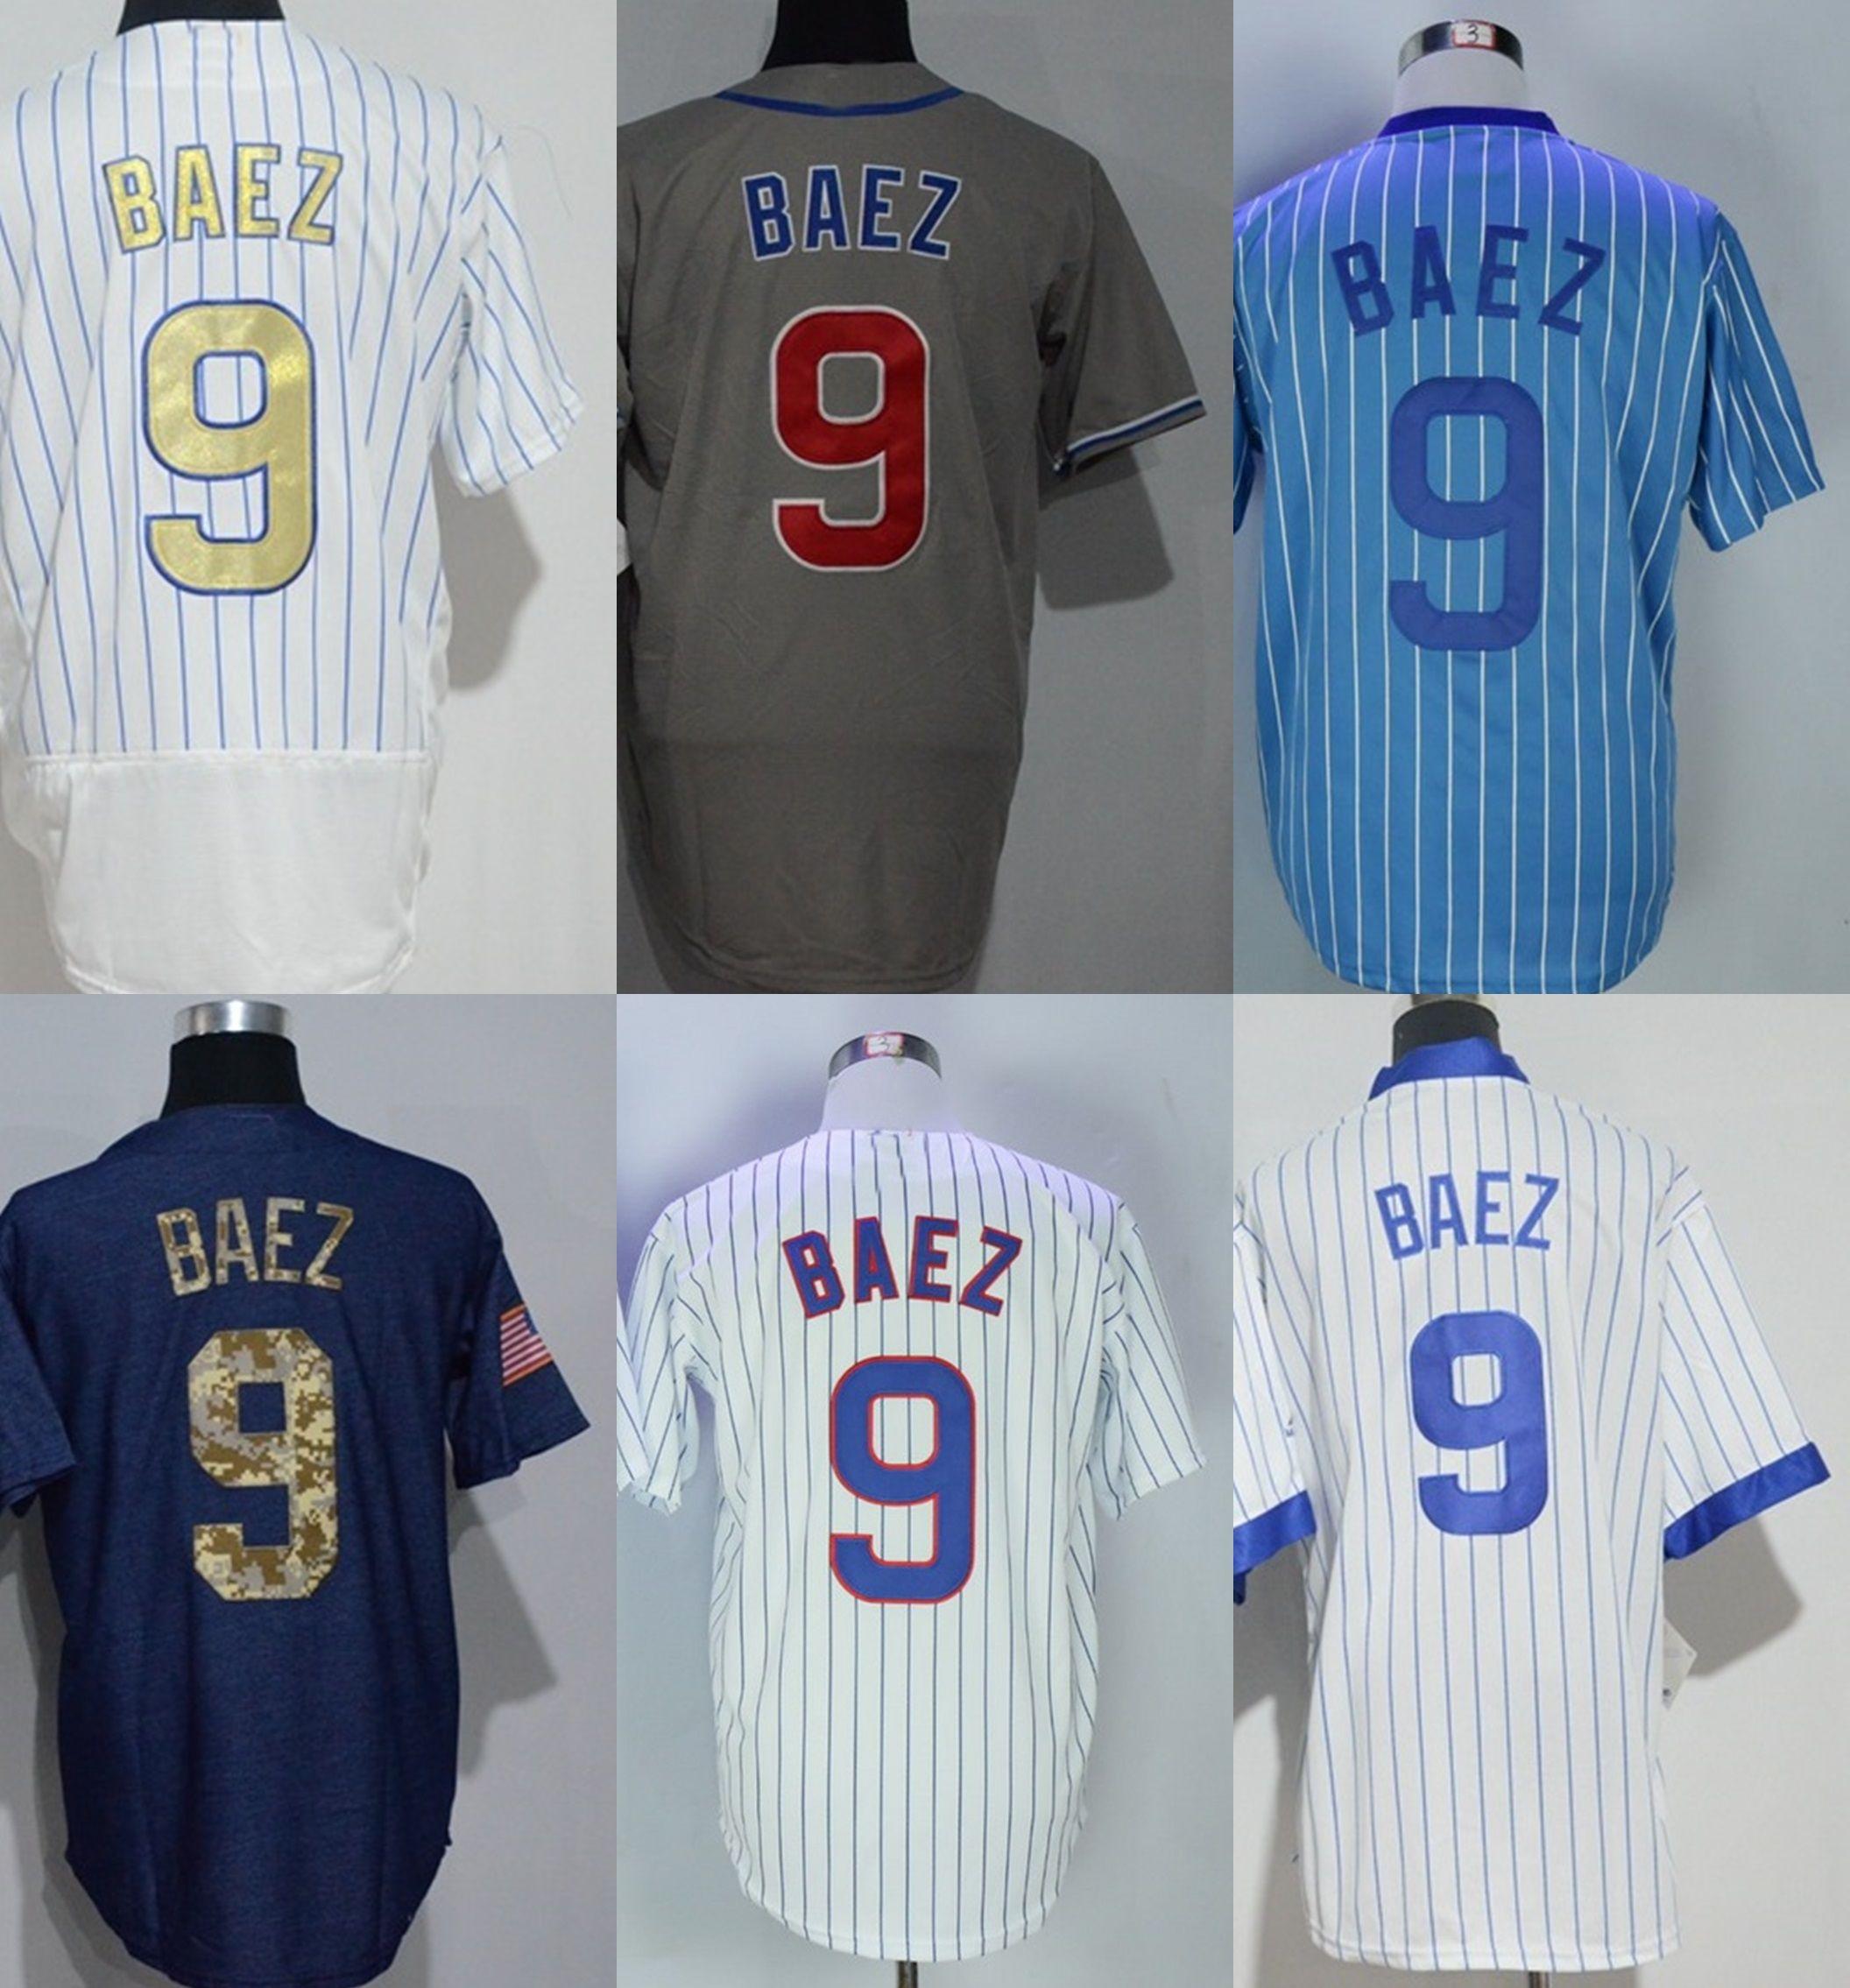 179f45a5a87 ... Cubs Authentic Blue Flex Base Jersey - Javier Baez 2017 100%  Embrodiered Cheap Quality Mens Womens Kids Chicago 9 Javier Baez Grey Blue  White ...